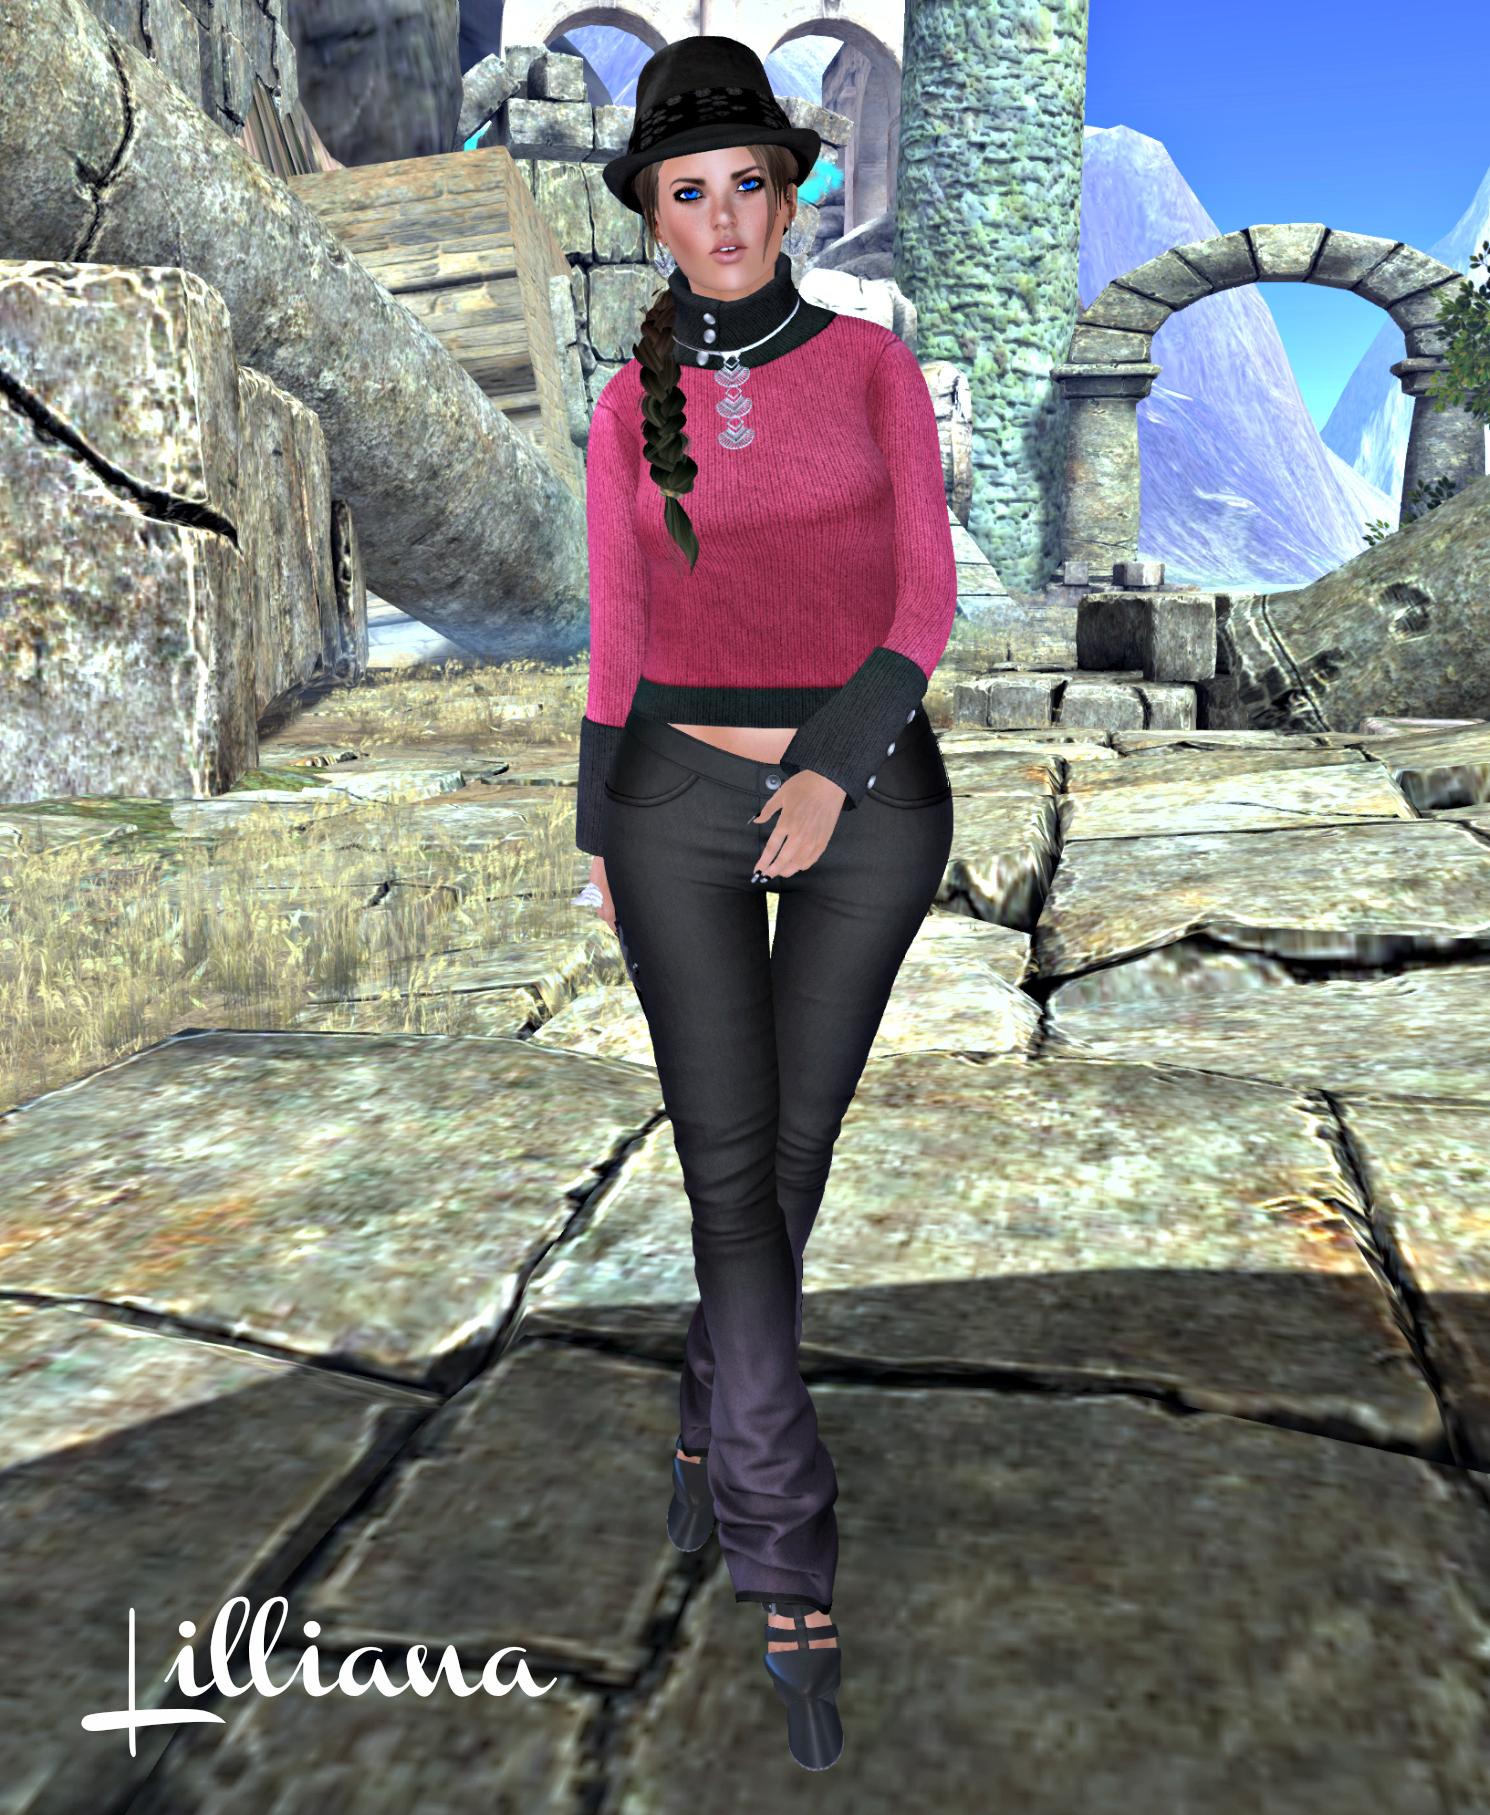 Poison Ivy, 7 Deadly, IT, Ecru, DS, Shoes, Clutch, IOS 3L_cropped